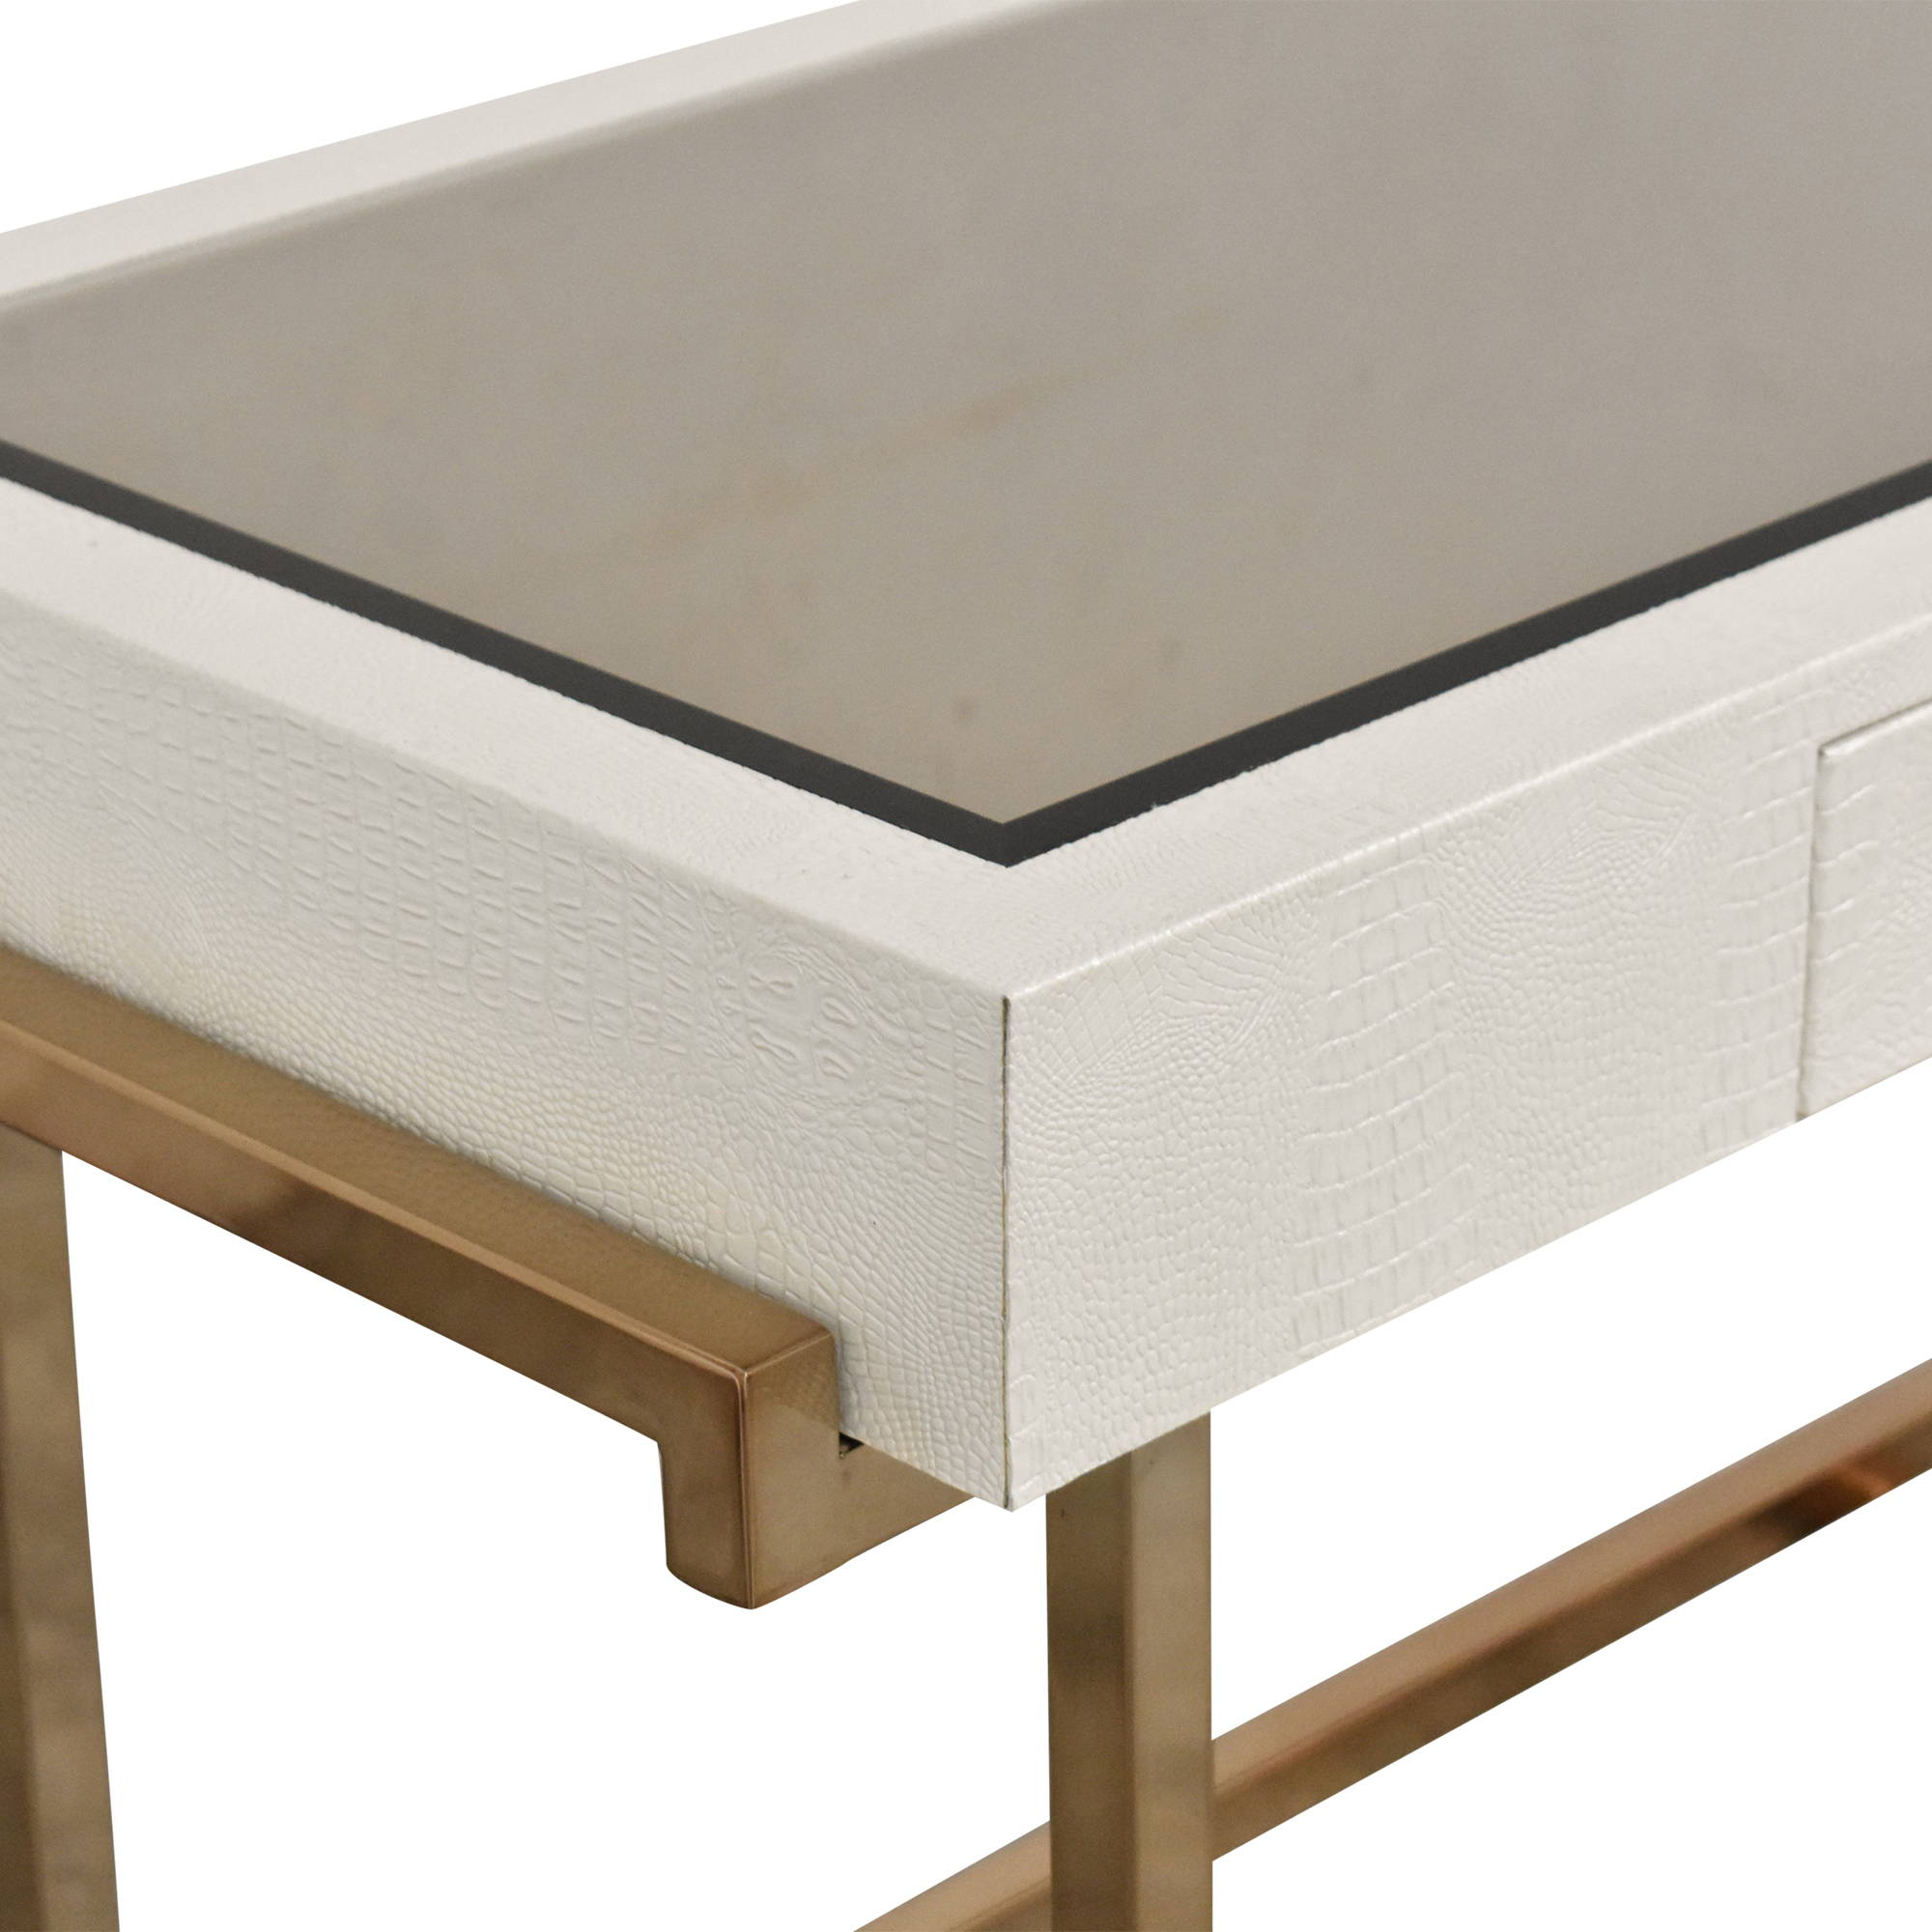 buy Acme White Rectangular One Drawer Writing Desk Acme